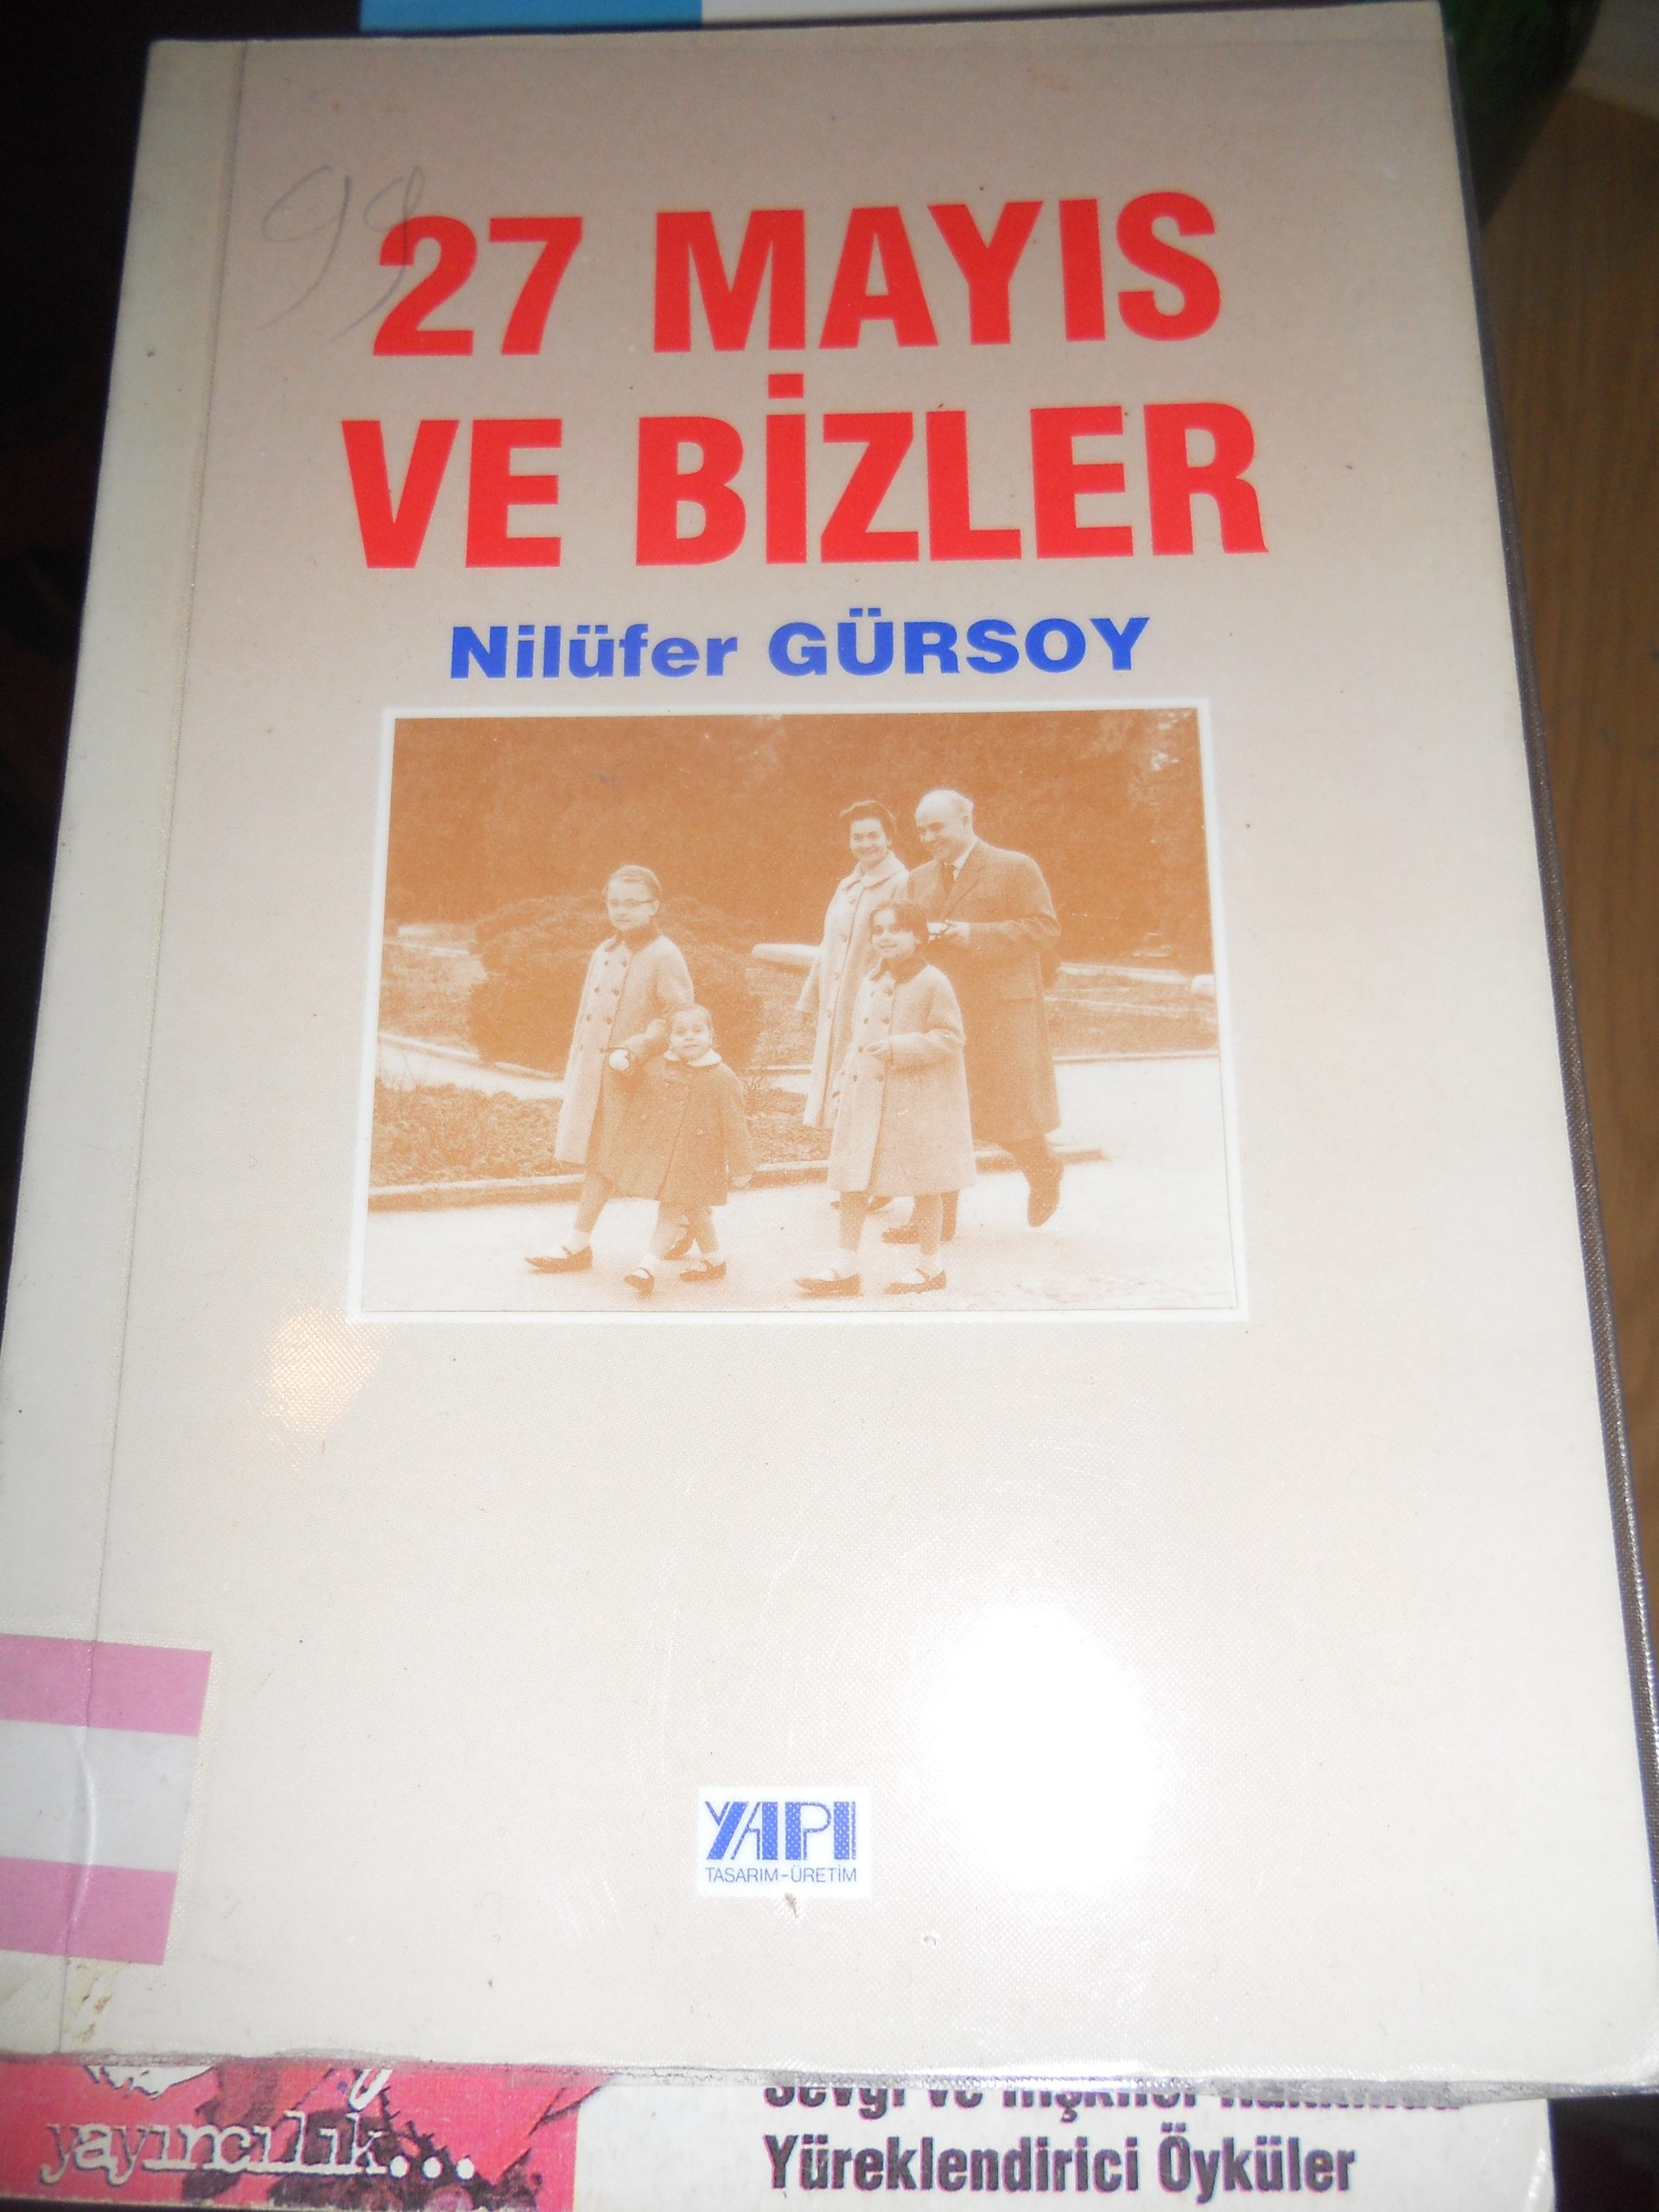 27 MAYIS VE BİZLER/Nilüfer GÜRSOY/ 10 tl